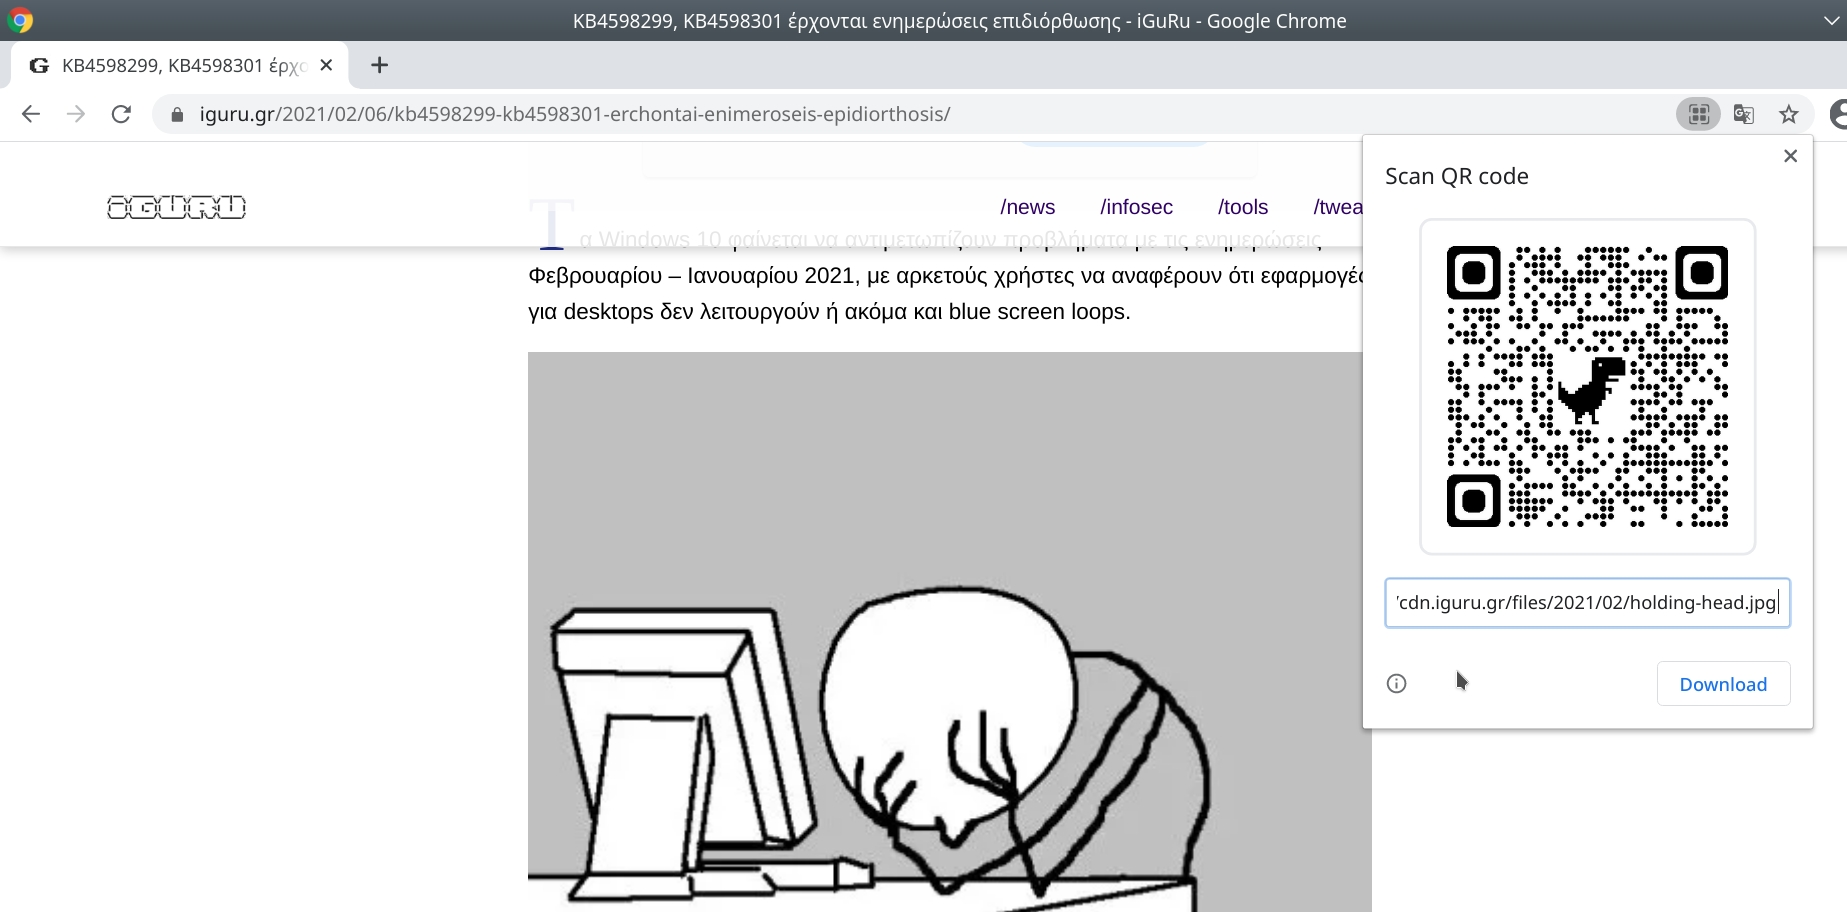 qr photo - Chrome 88 μοιραστείτε σελίδες με QR Code